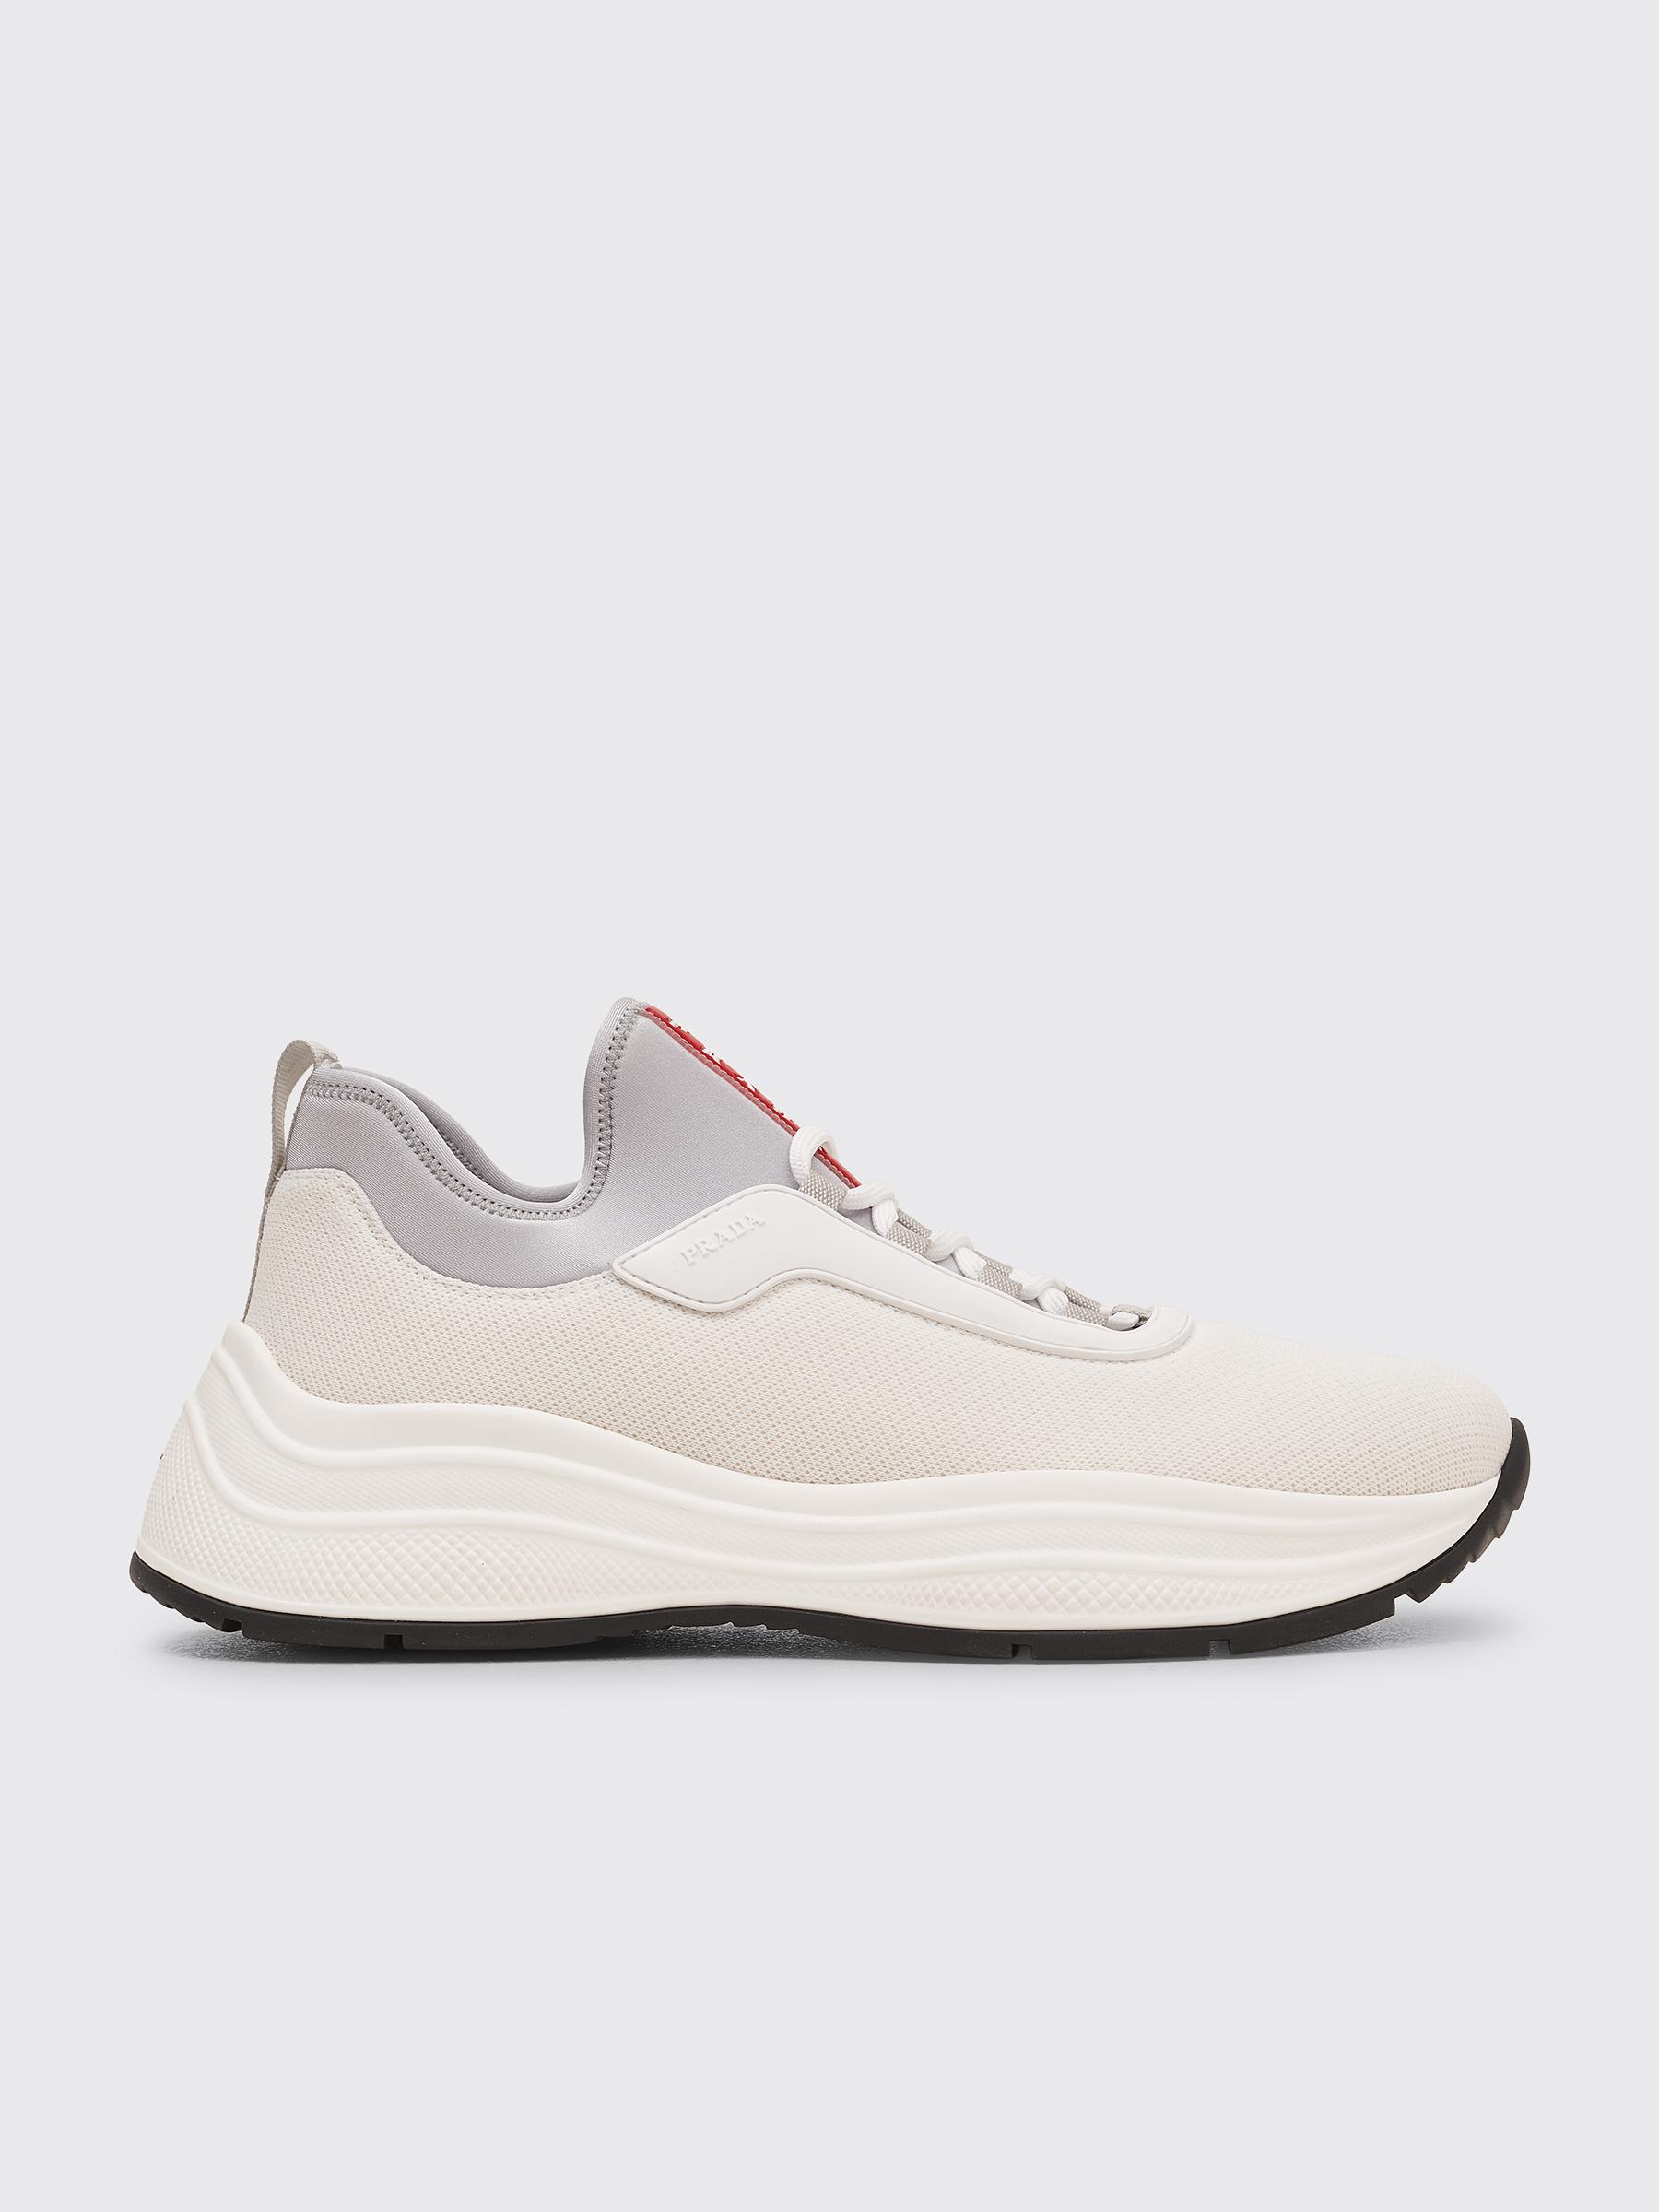 Prada Mesh Neoprene Sneakers White